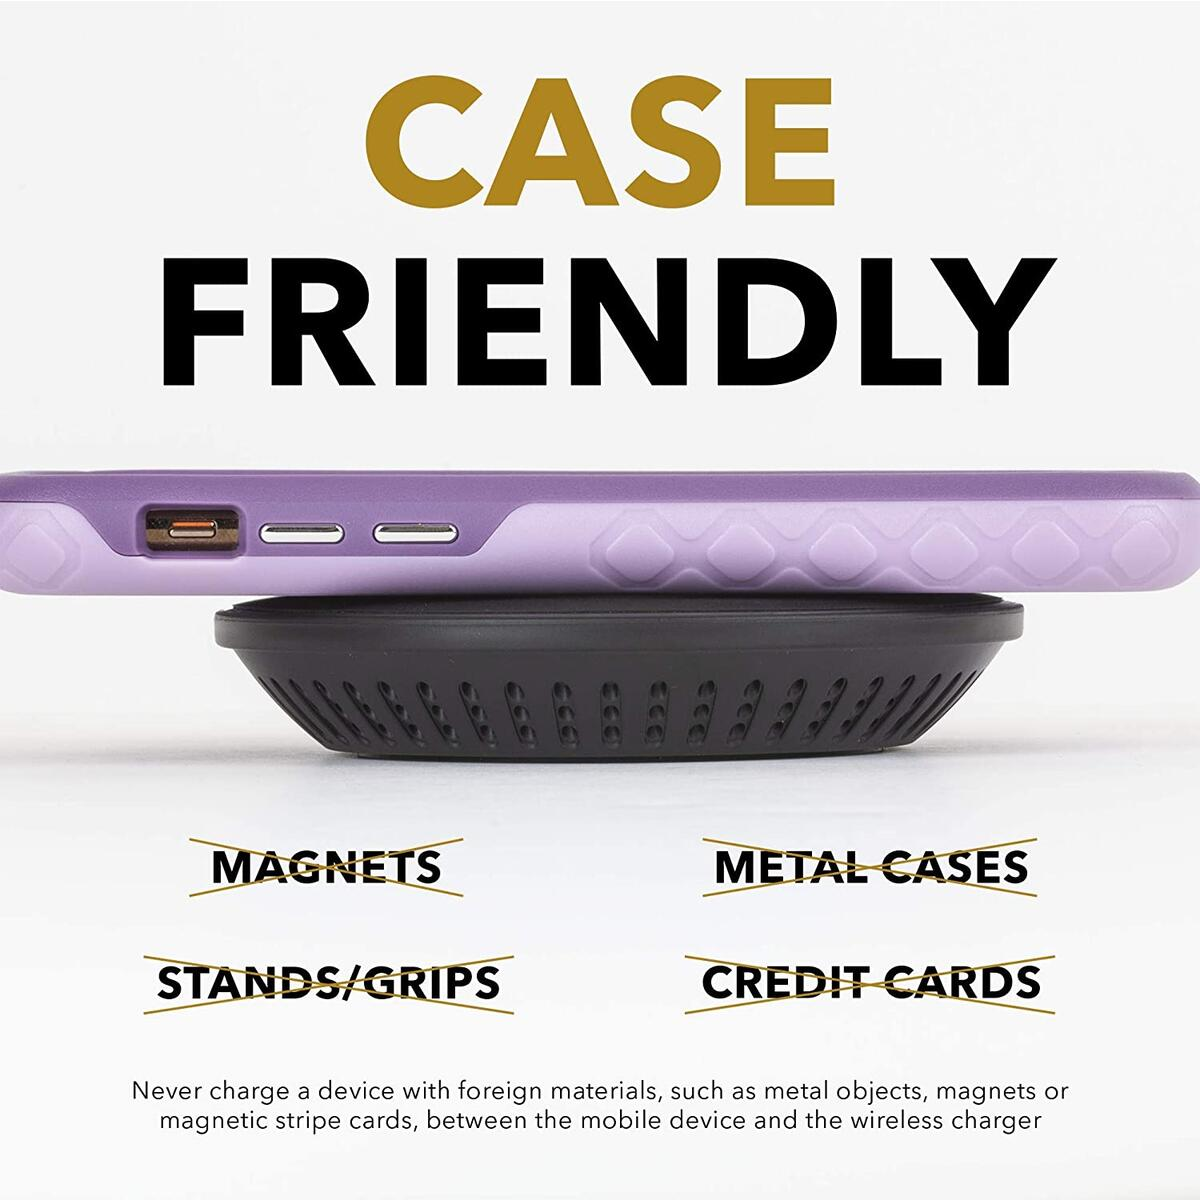 cellhelmet Qi Certified Wireless Charger - Fast Charging (10W / 7.5W / 5W) w AC Adapter | As Seen on Shark Tank - Retail Package